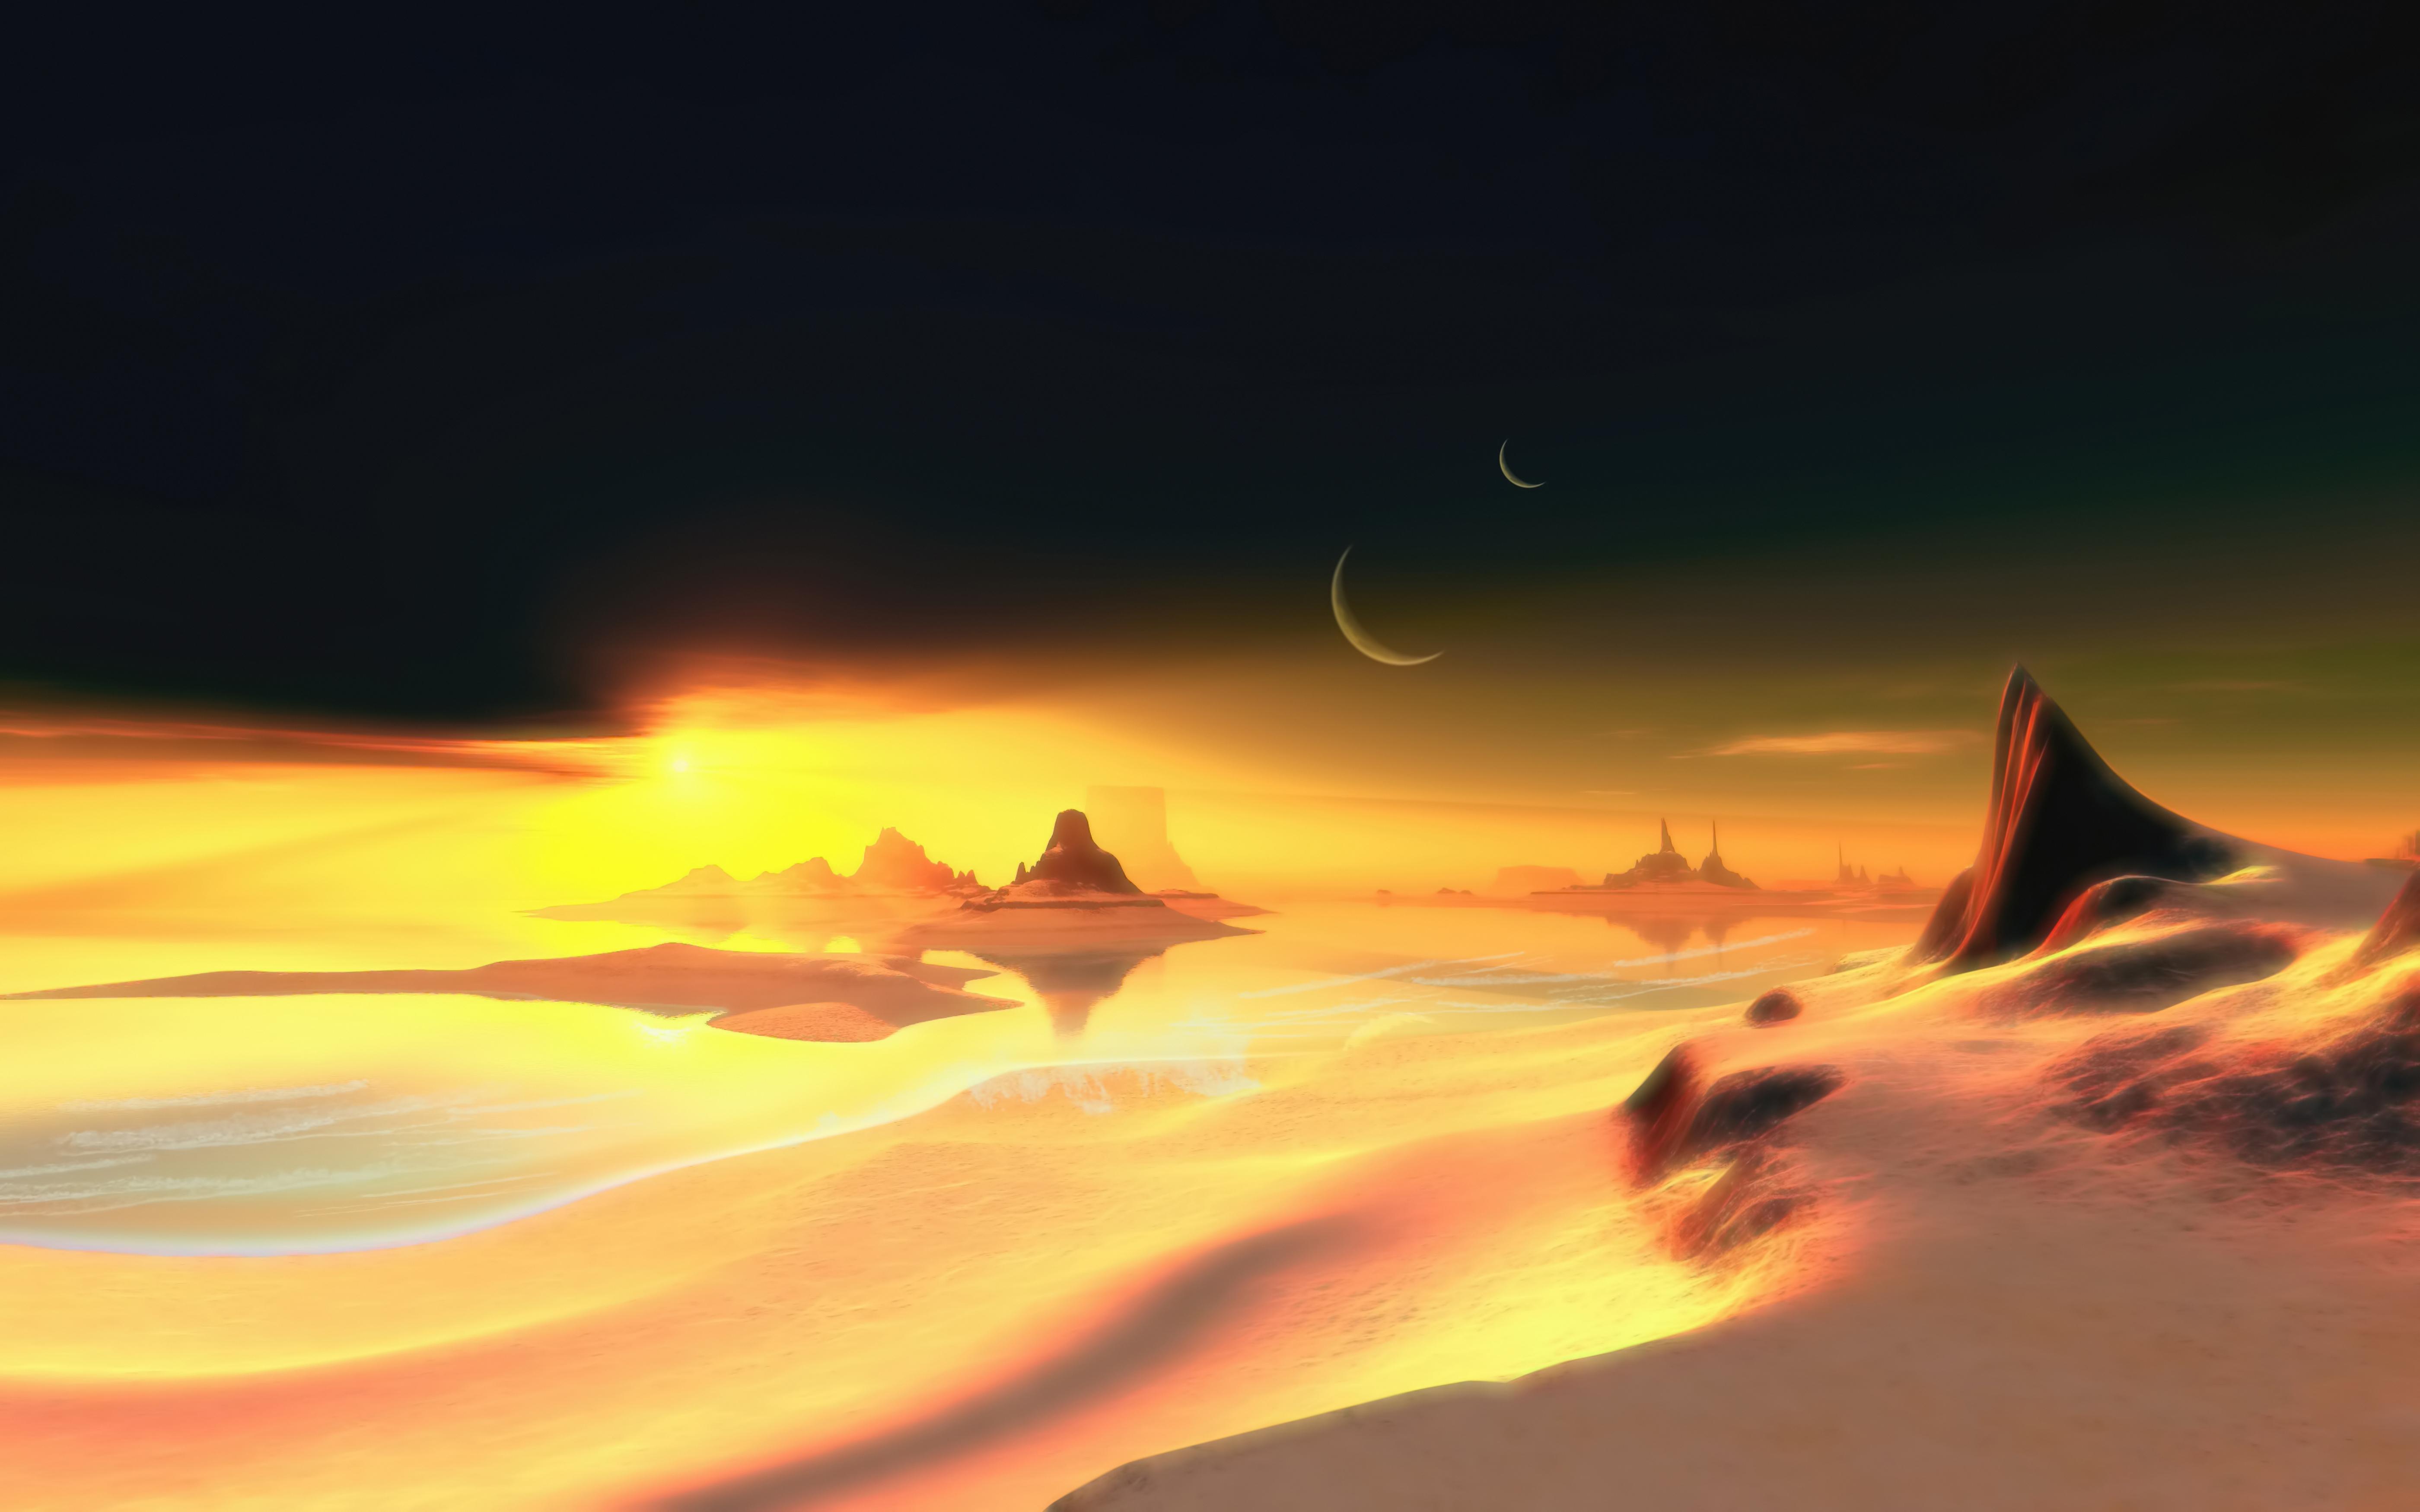 dune sea digital art 1578254989 - Dune Sea Digital Art -